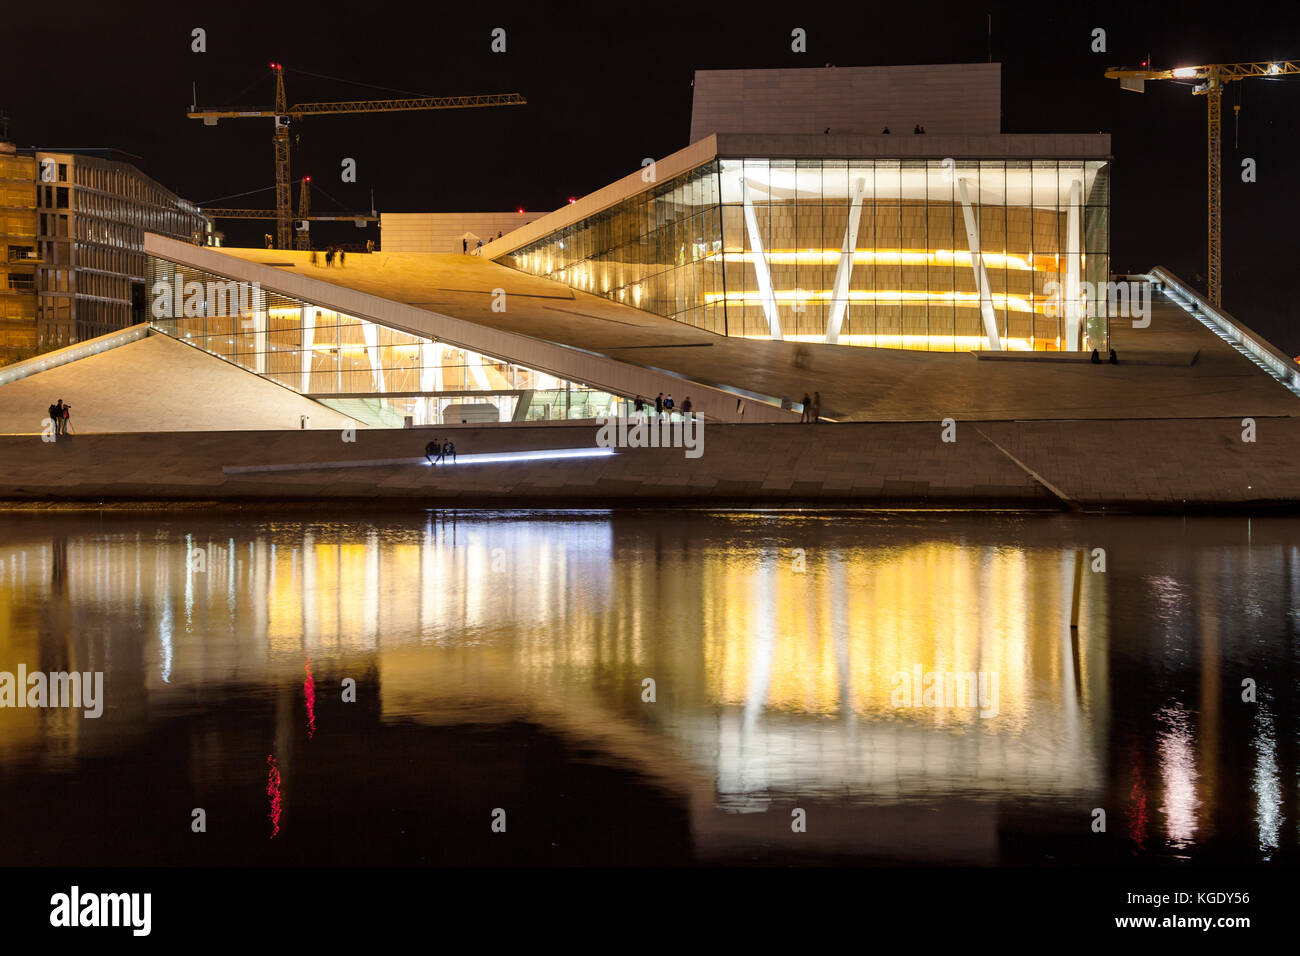 Operahuset in Oslo, Norway, at night. - Stock Image